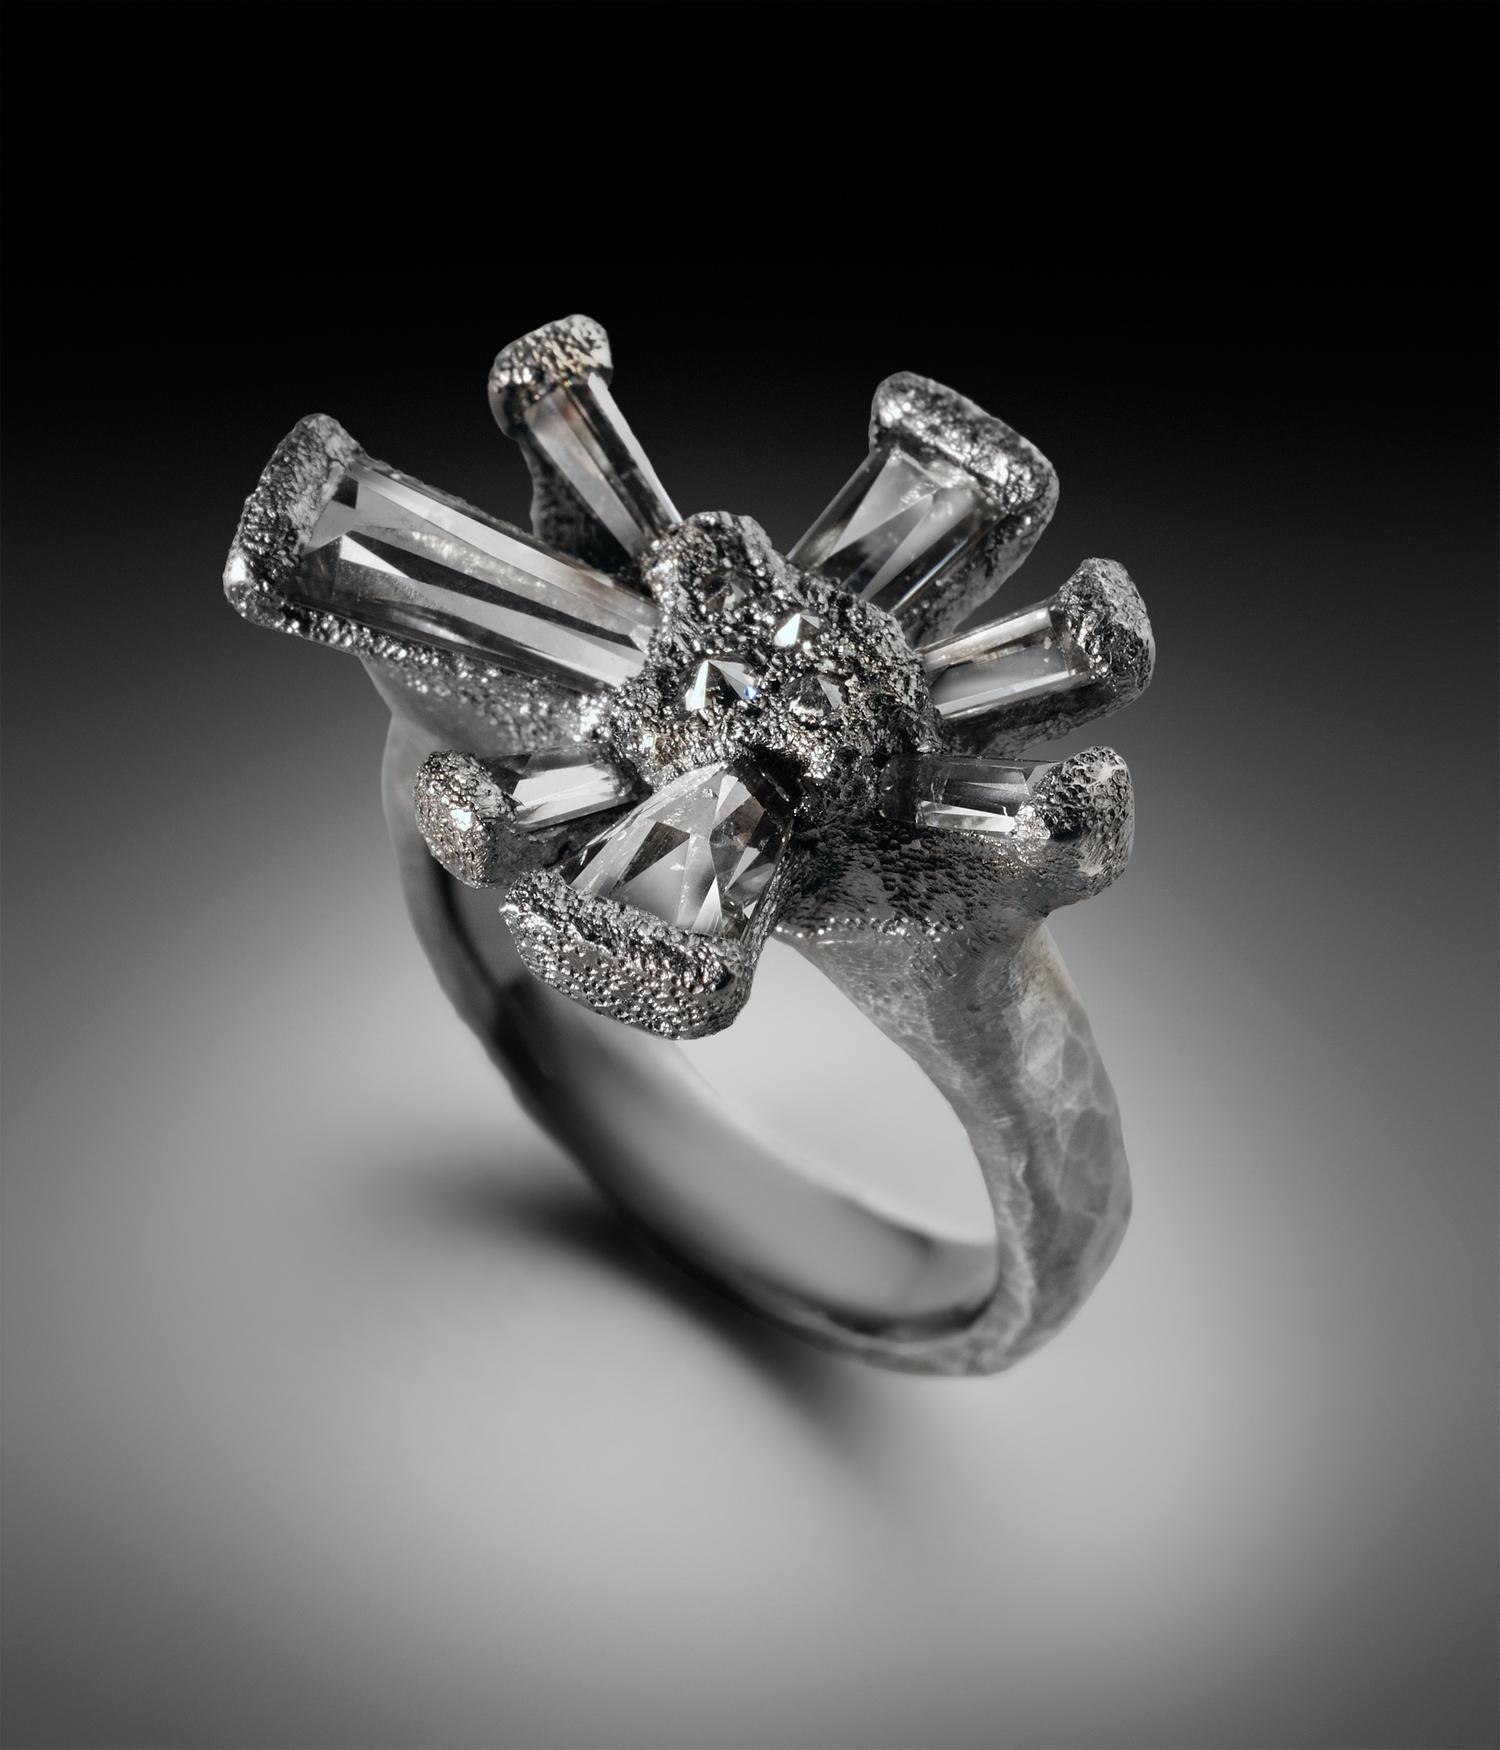 Burst-Ring+Palladium-+Diamond_TAP_by_Todd_Pownell.jpg